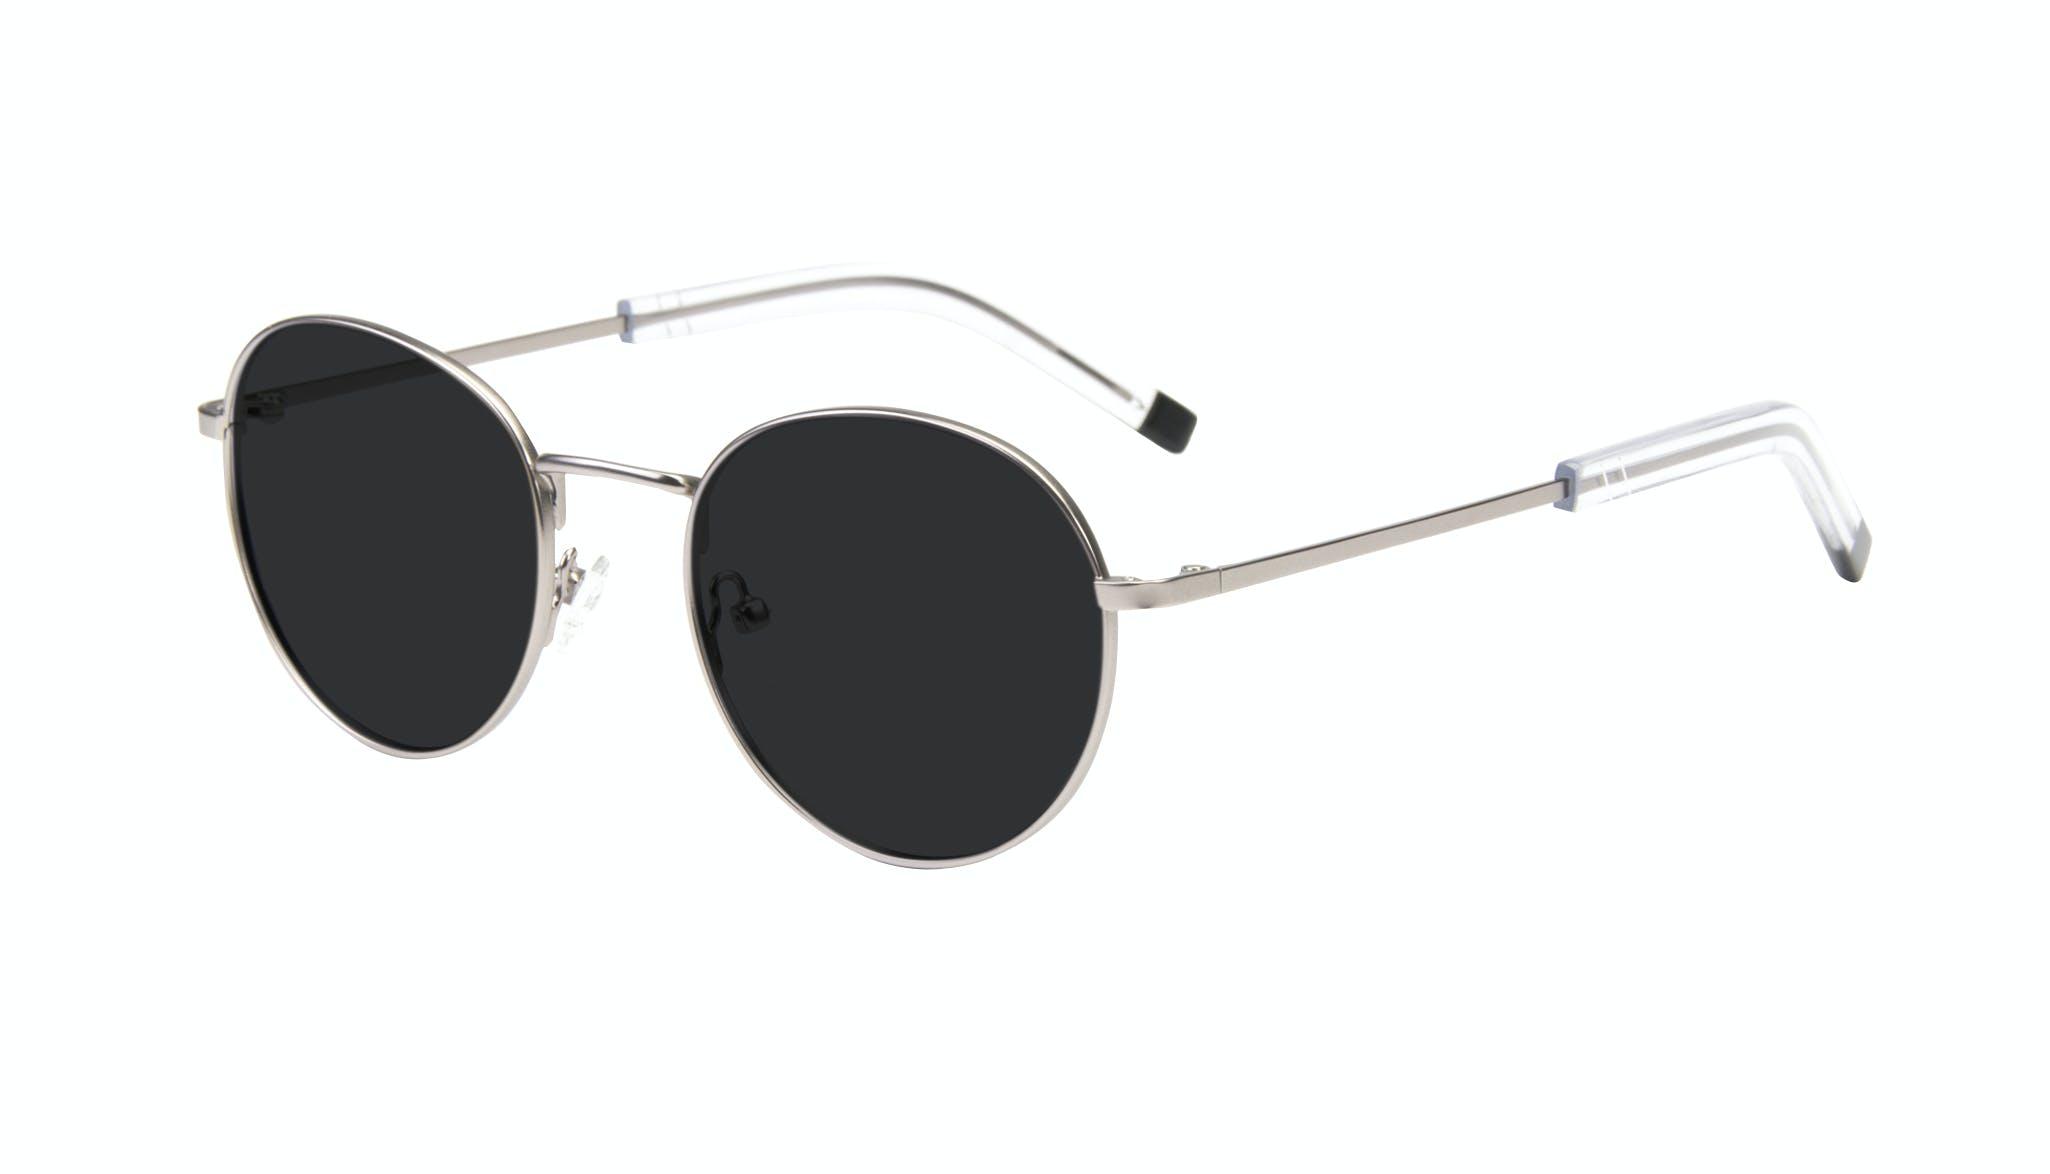 Affordable Fashion Glasses Round Sunglasses Men Lean Steel Tilt